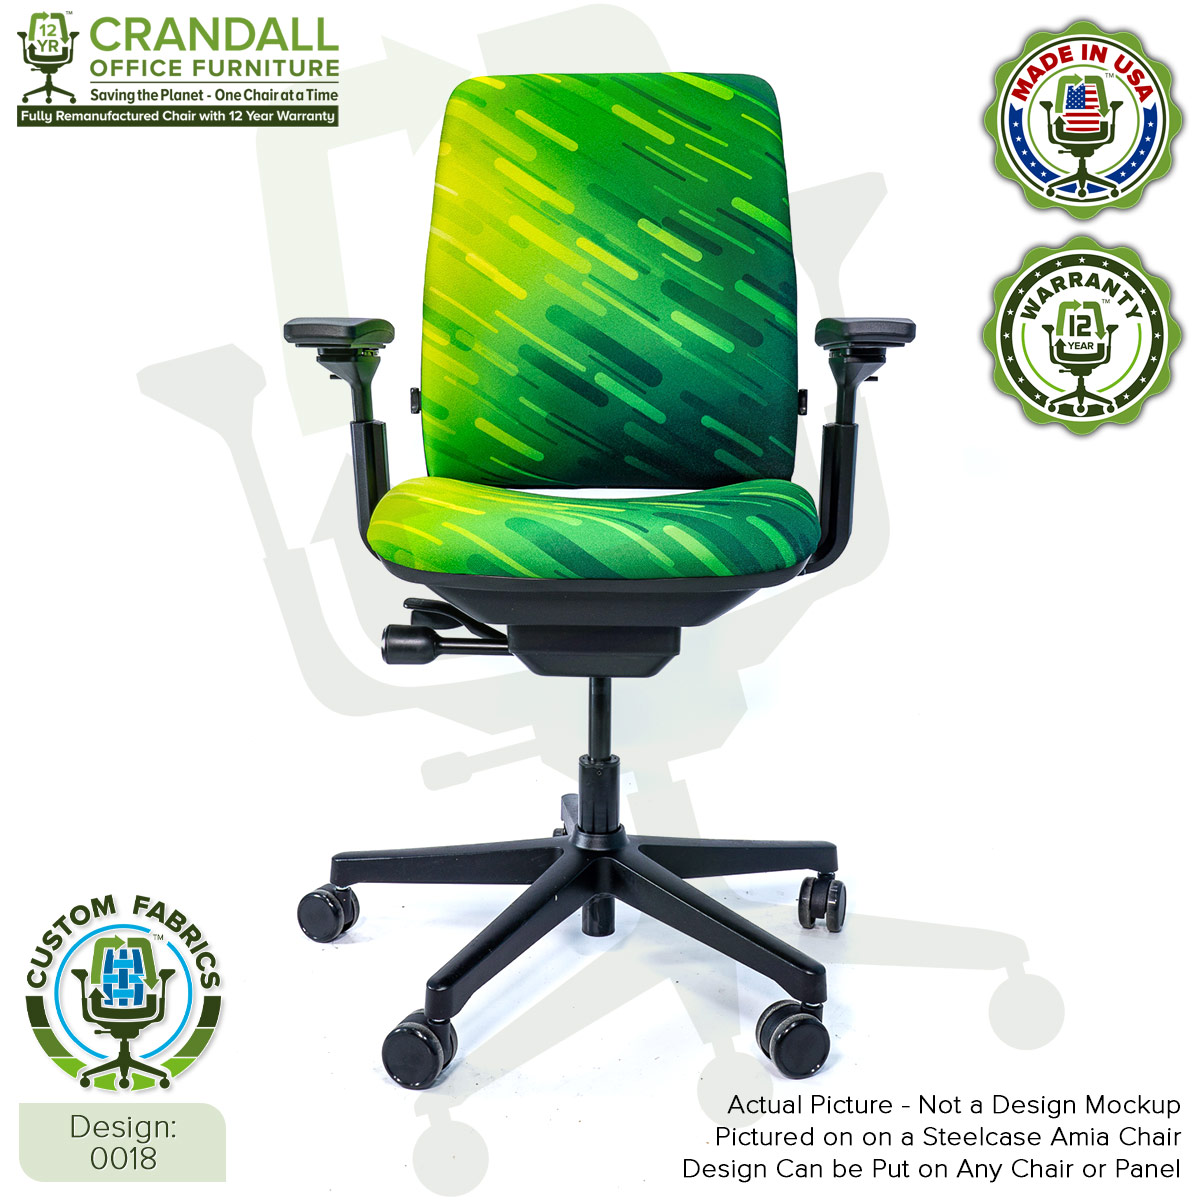 Custom Fabric Remanufactured Steelcase Amia Chair - Design 0018